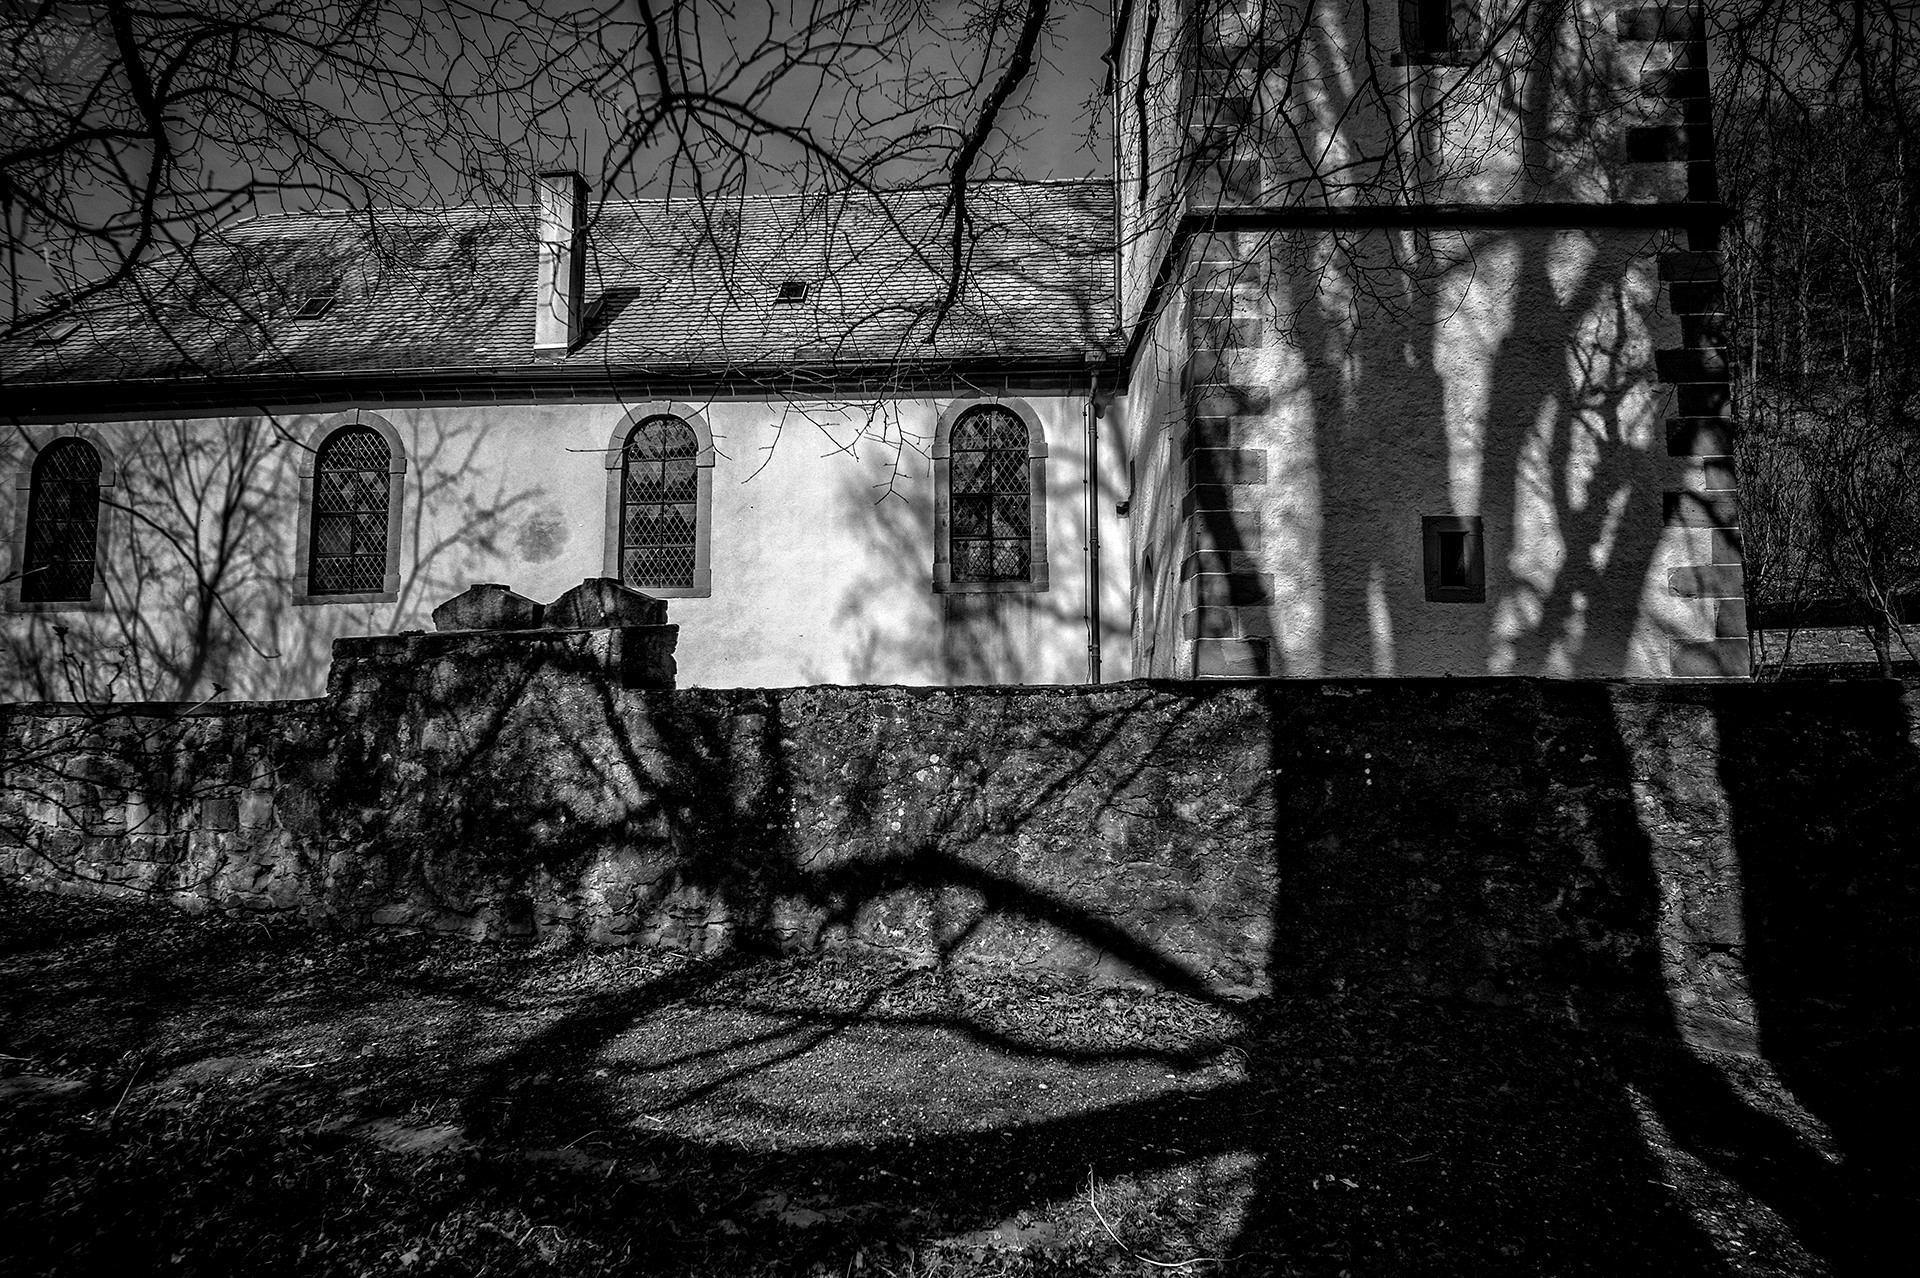 KirchenImDekanat-1001201 by .